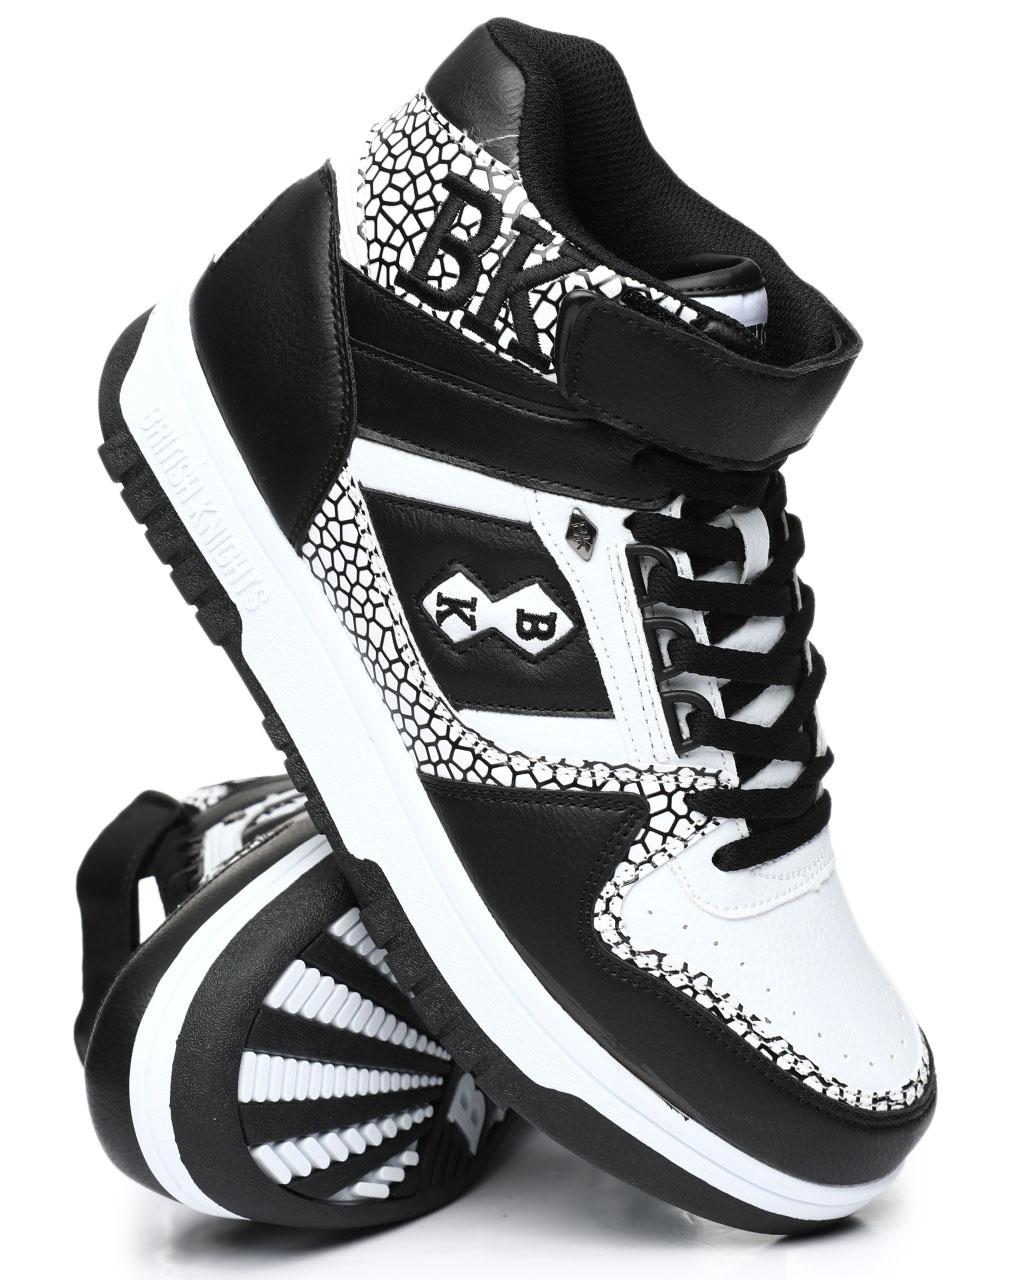 Buy Kings SL Deluxe Sneakers Men's